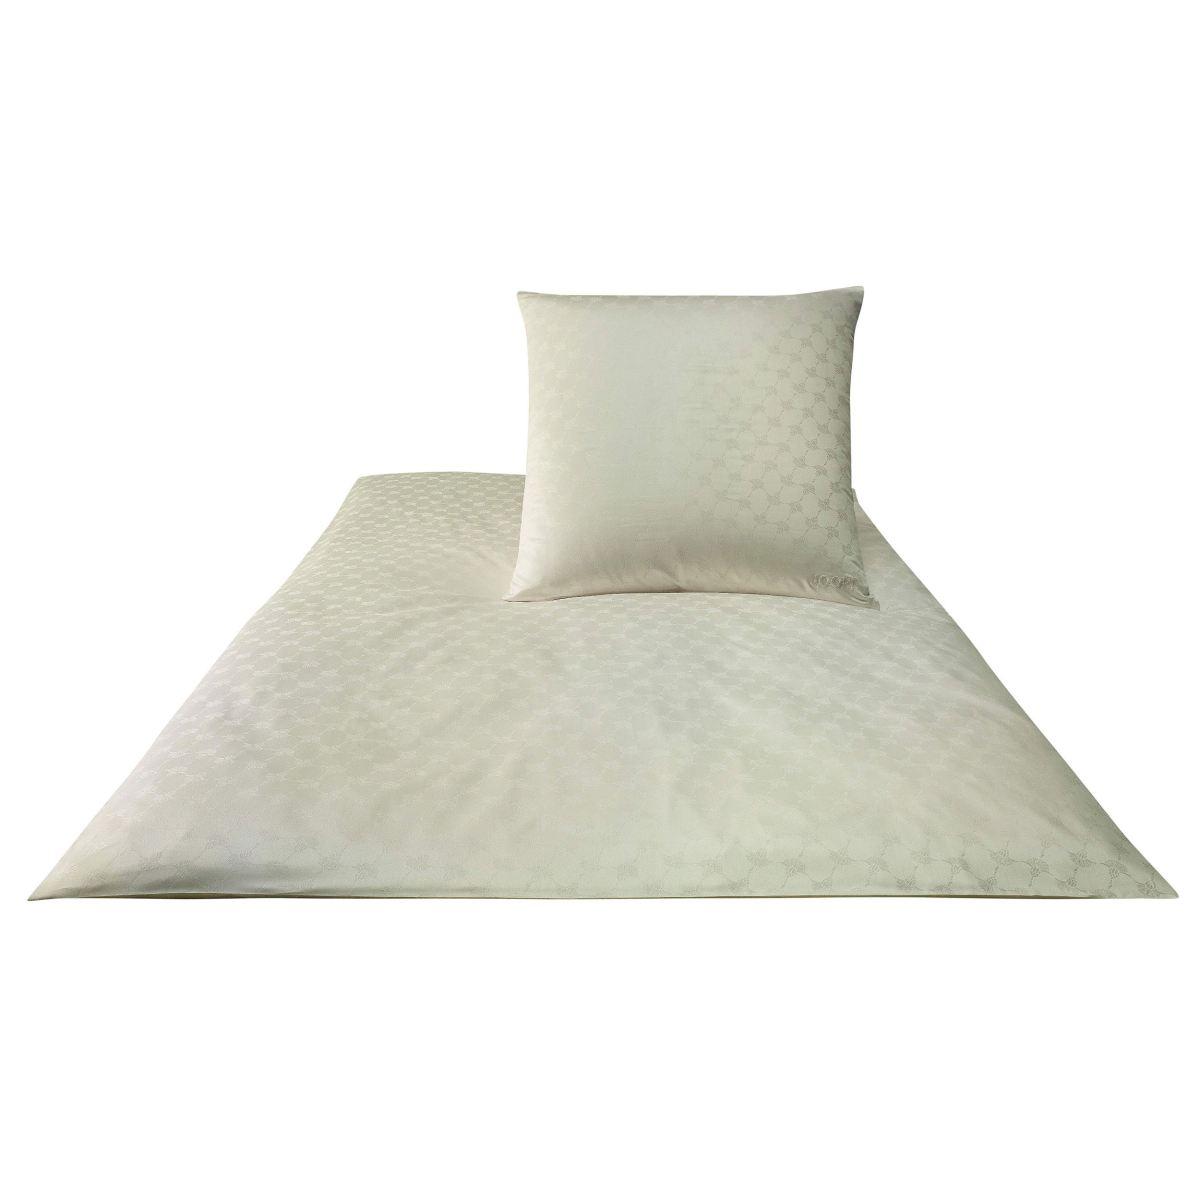 joop designer bettw sche cornflower champagner 155 x 200 cm porta. Black Bedroom Furniture Sets. Home Design Ideas